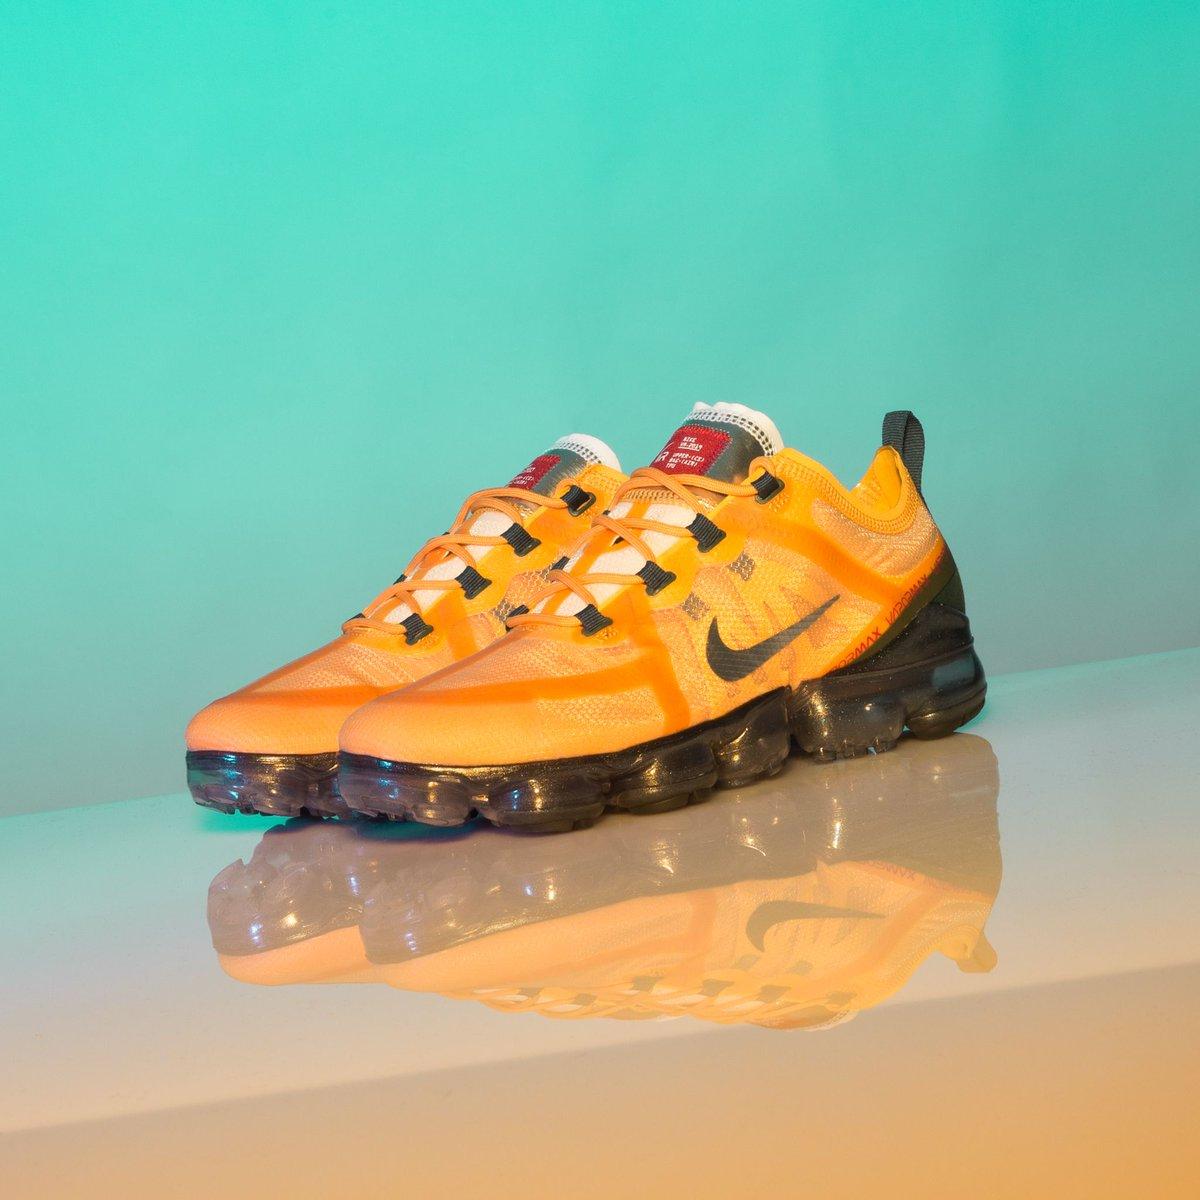 TITOLO's photo on Nike